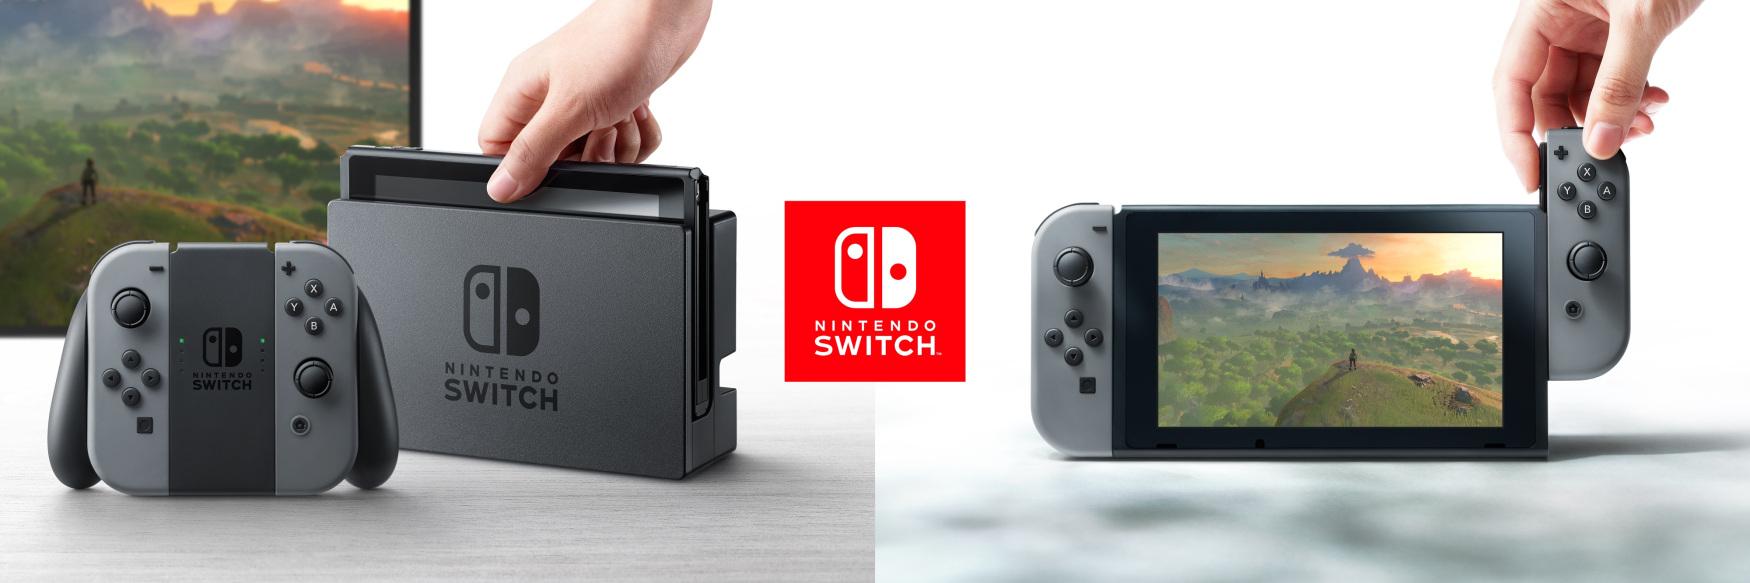 imagenes-nintendo-switch